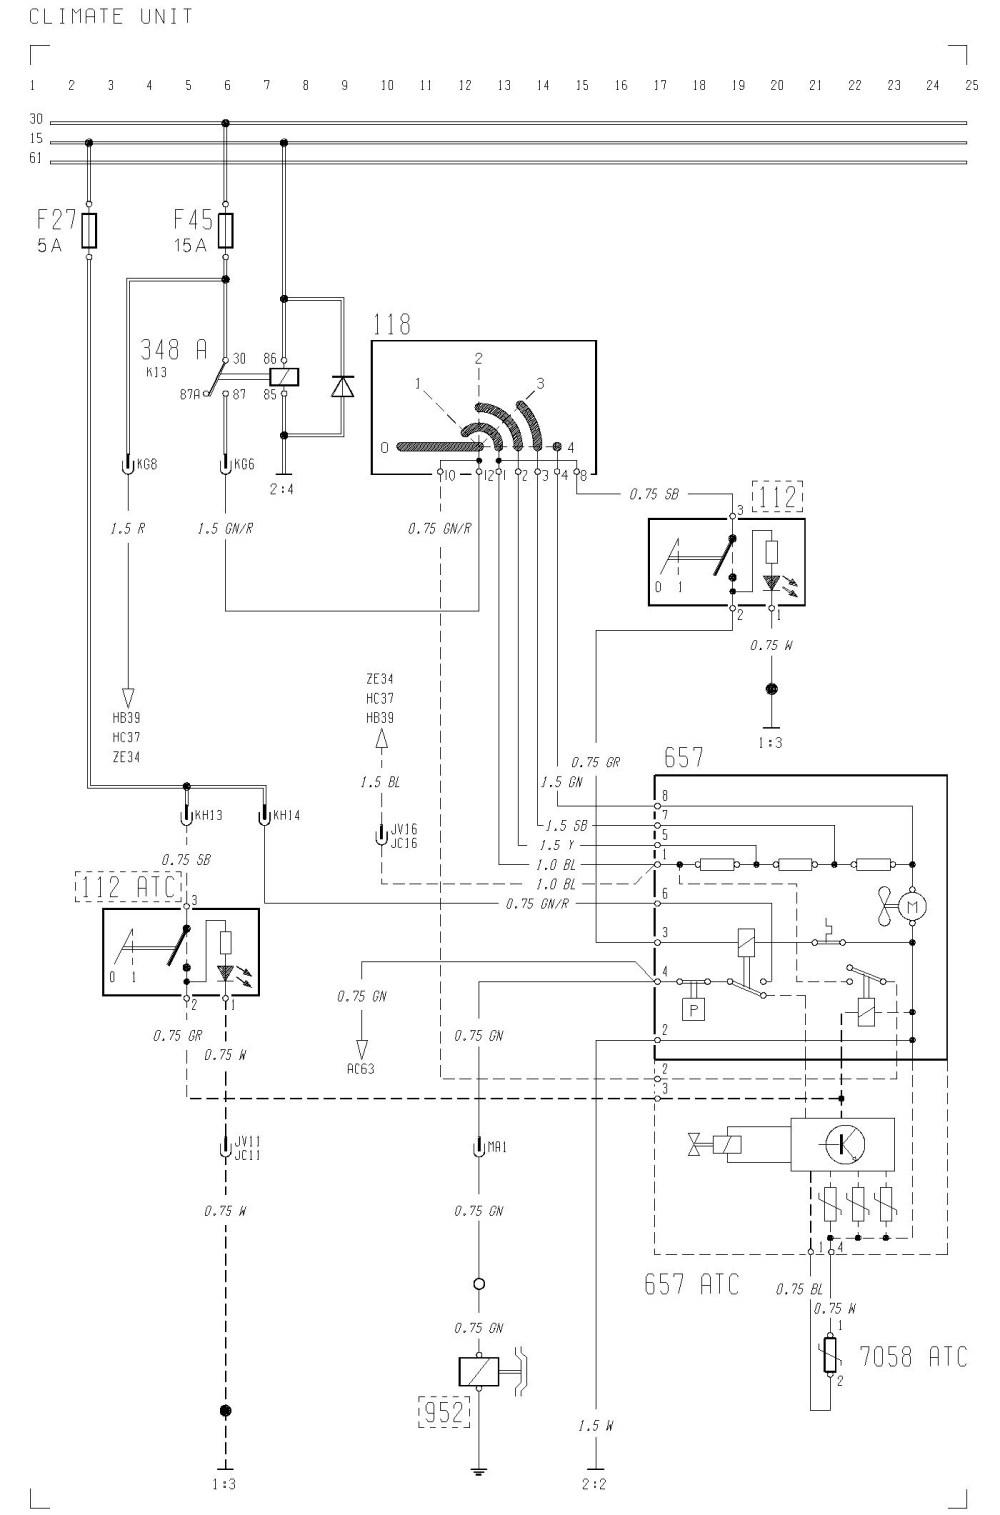 medium resolution of volvo f12 f16 wiring diagram climate unit carknowledge wiring diagram volvo f12